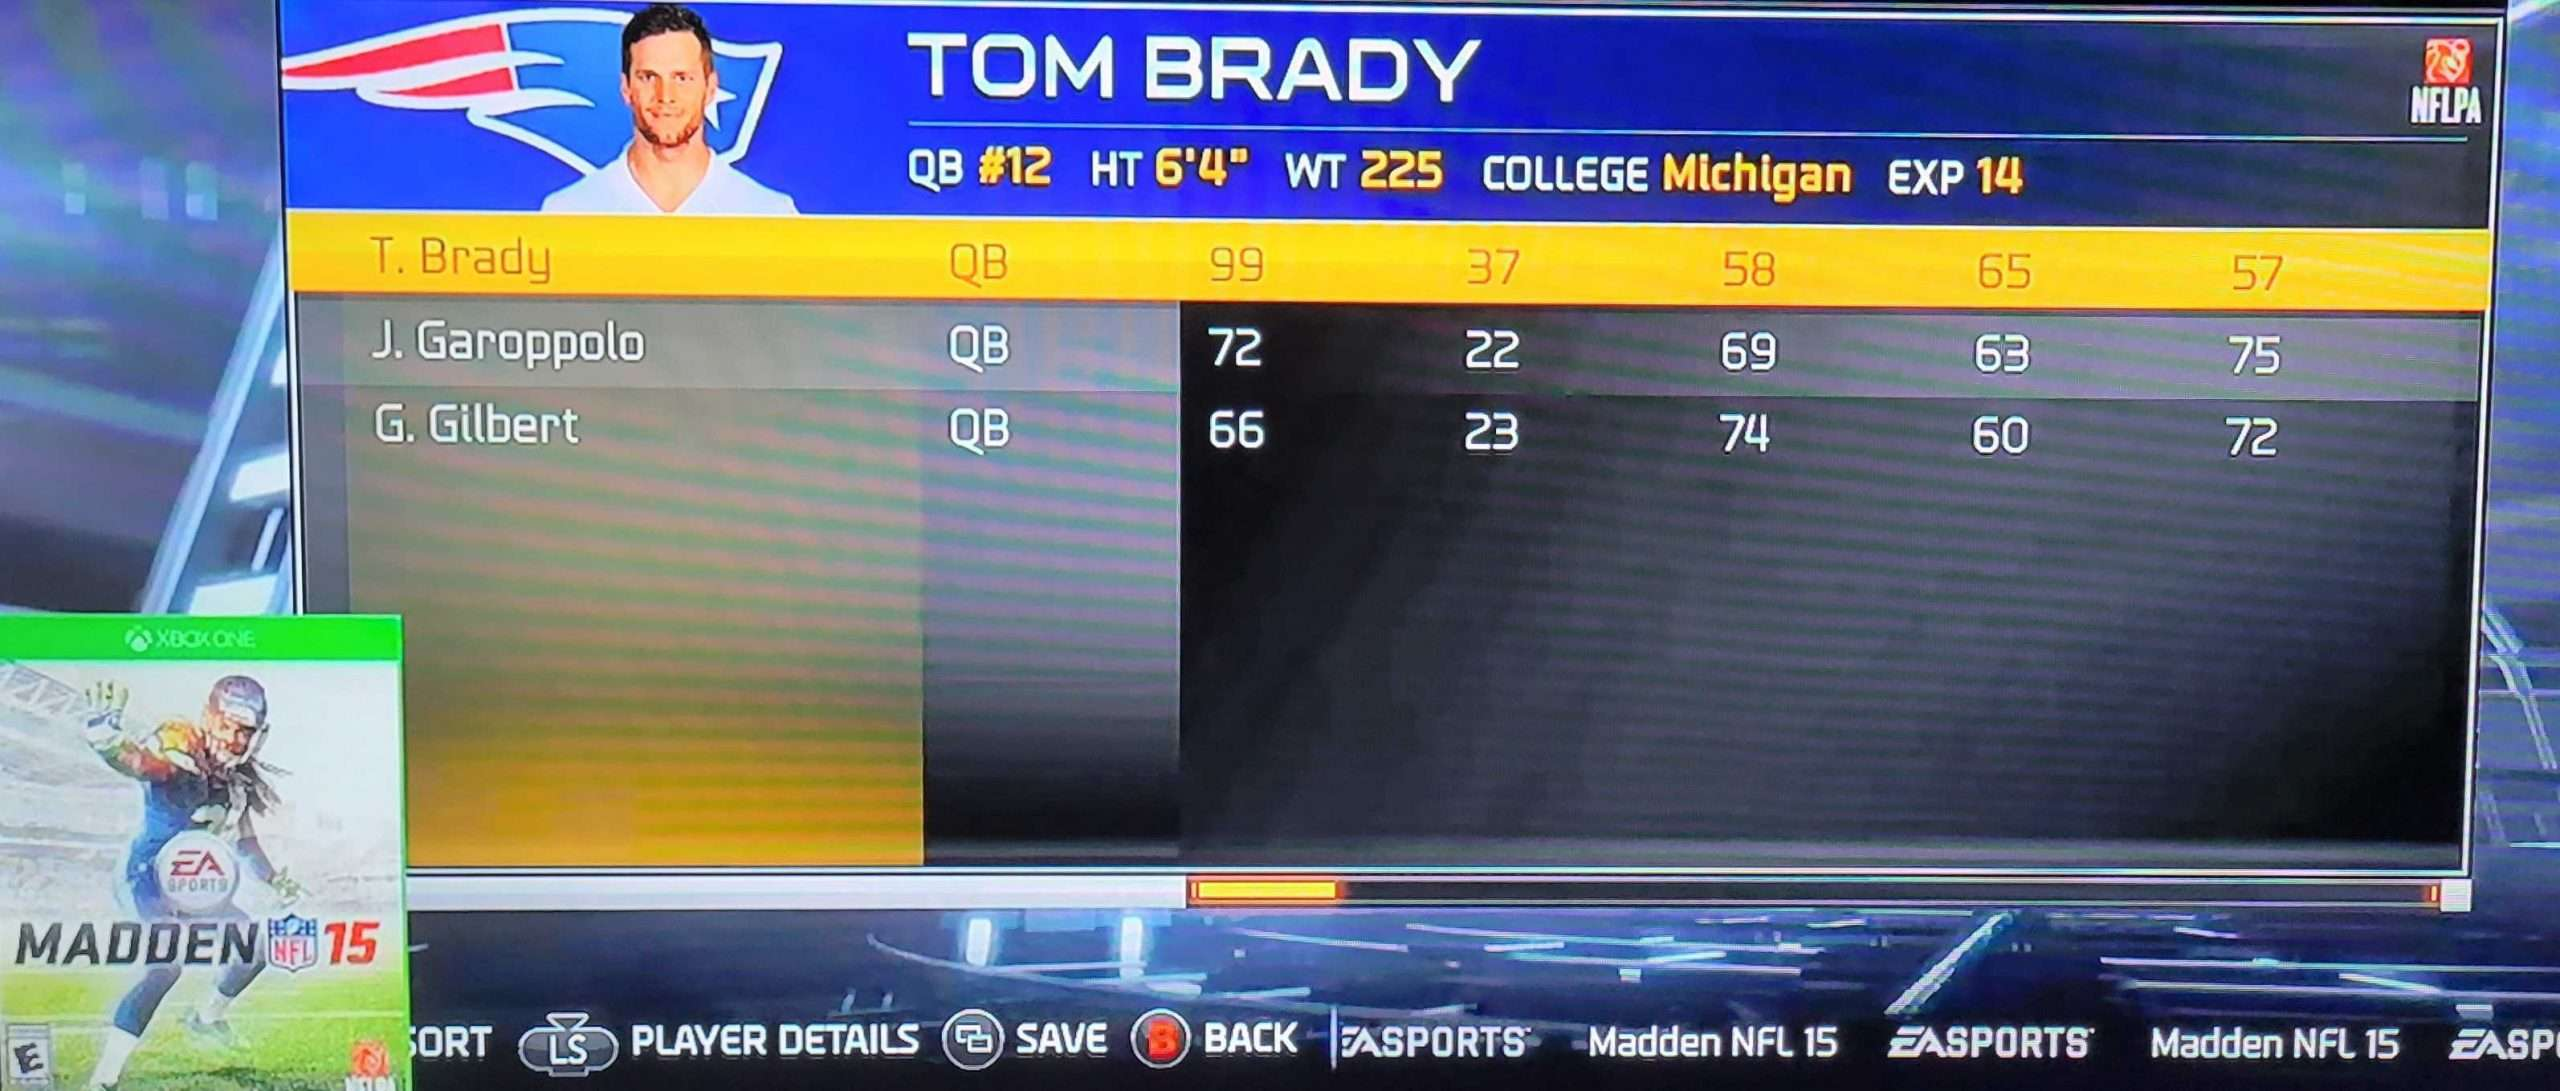 Tom Brady Madden 15 Ratings